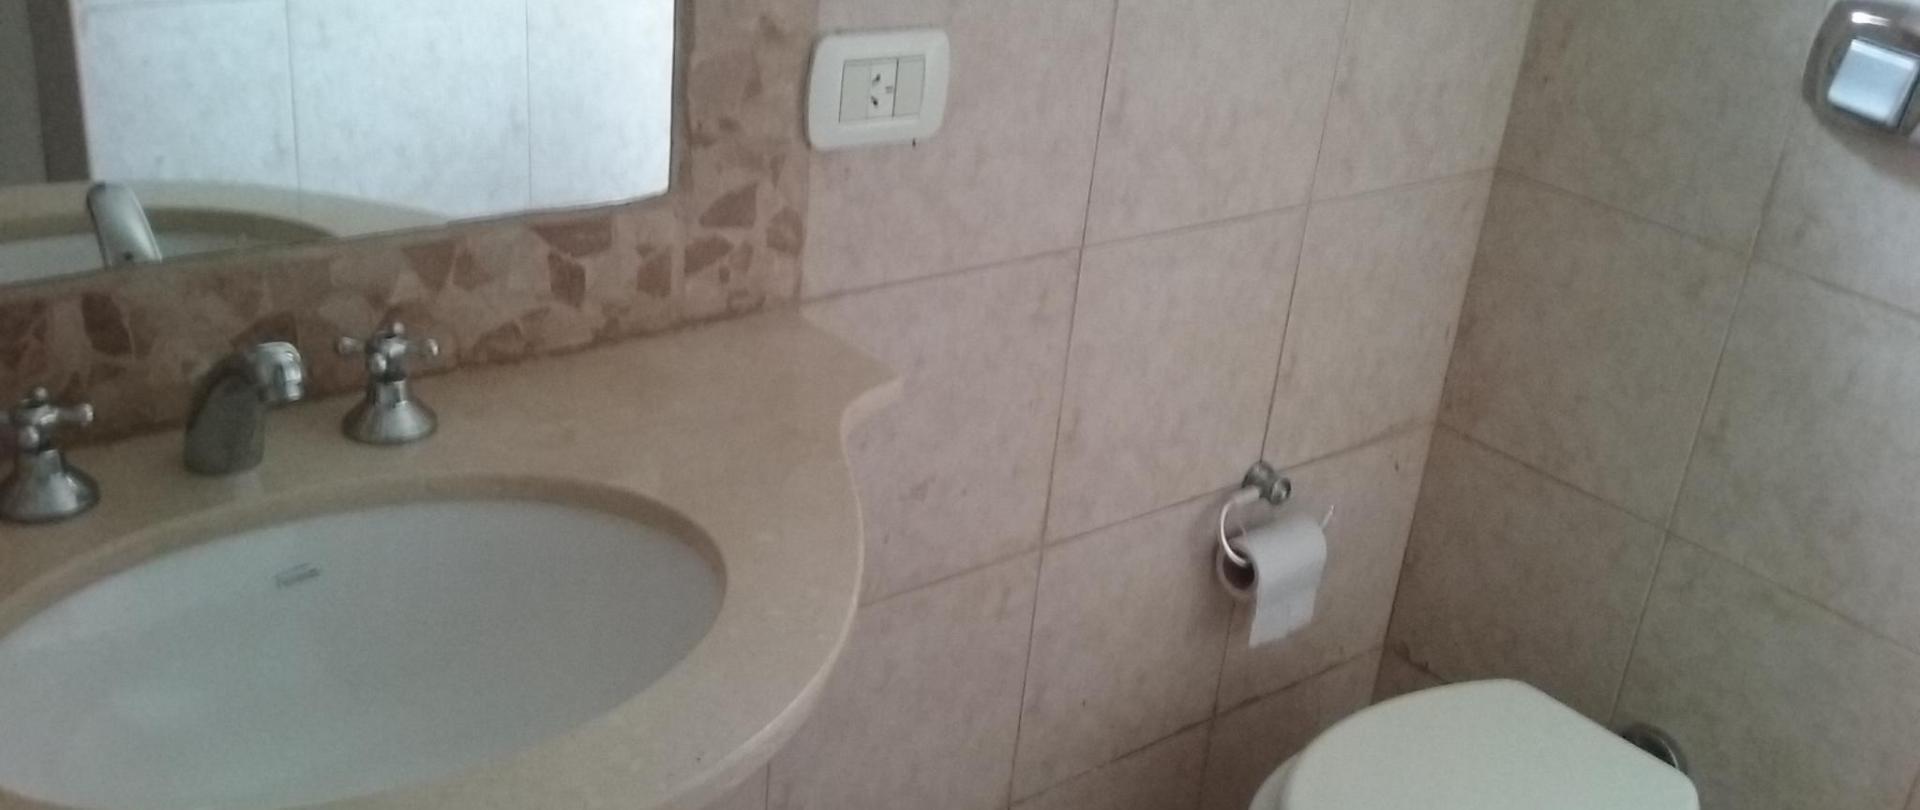 Baño Hotel Queguay.jpg